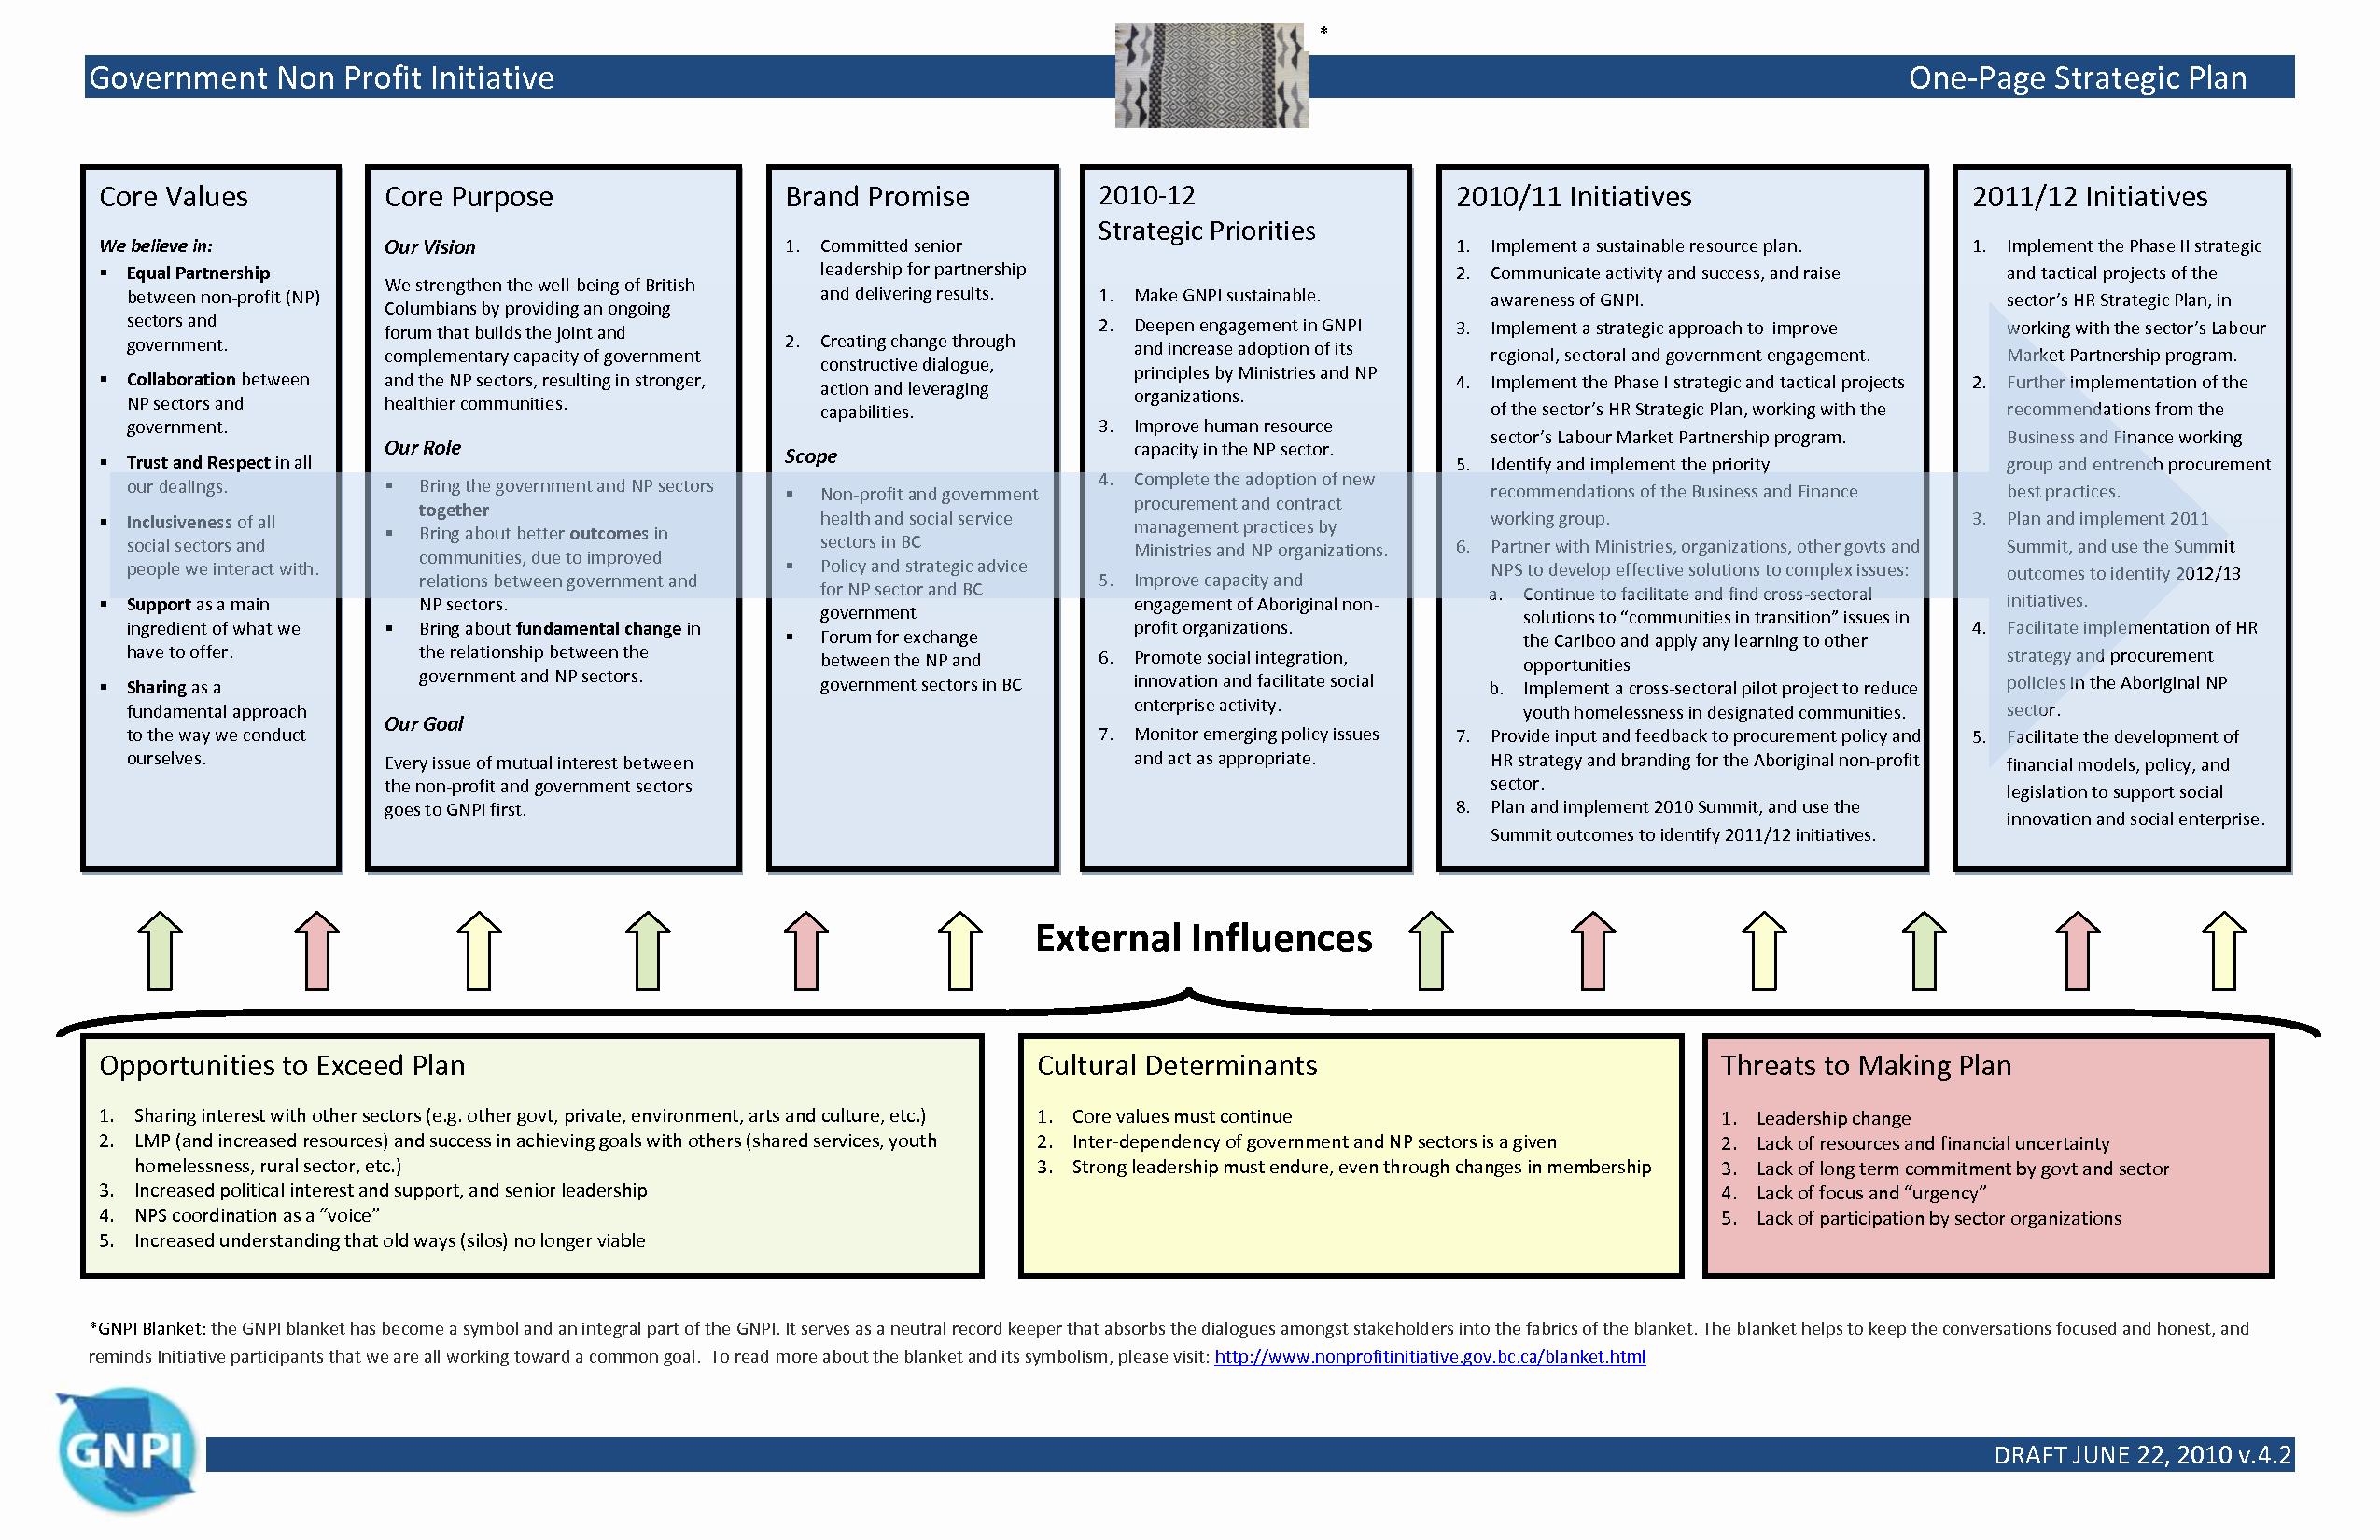 Strategic Plan Template for Nonprofits Unique Quotes About Strategic Plan 43 Quotes